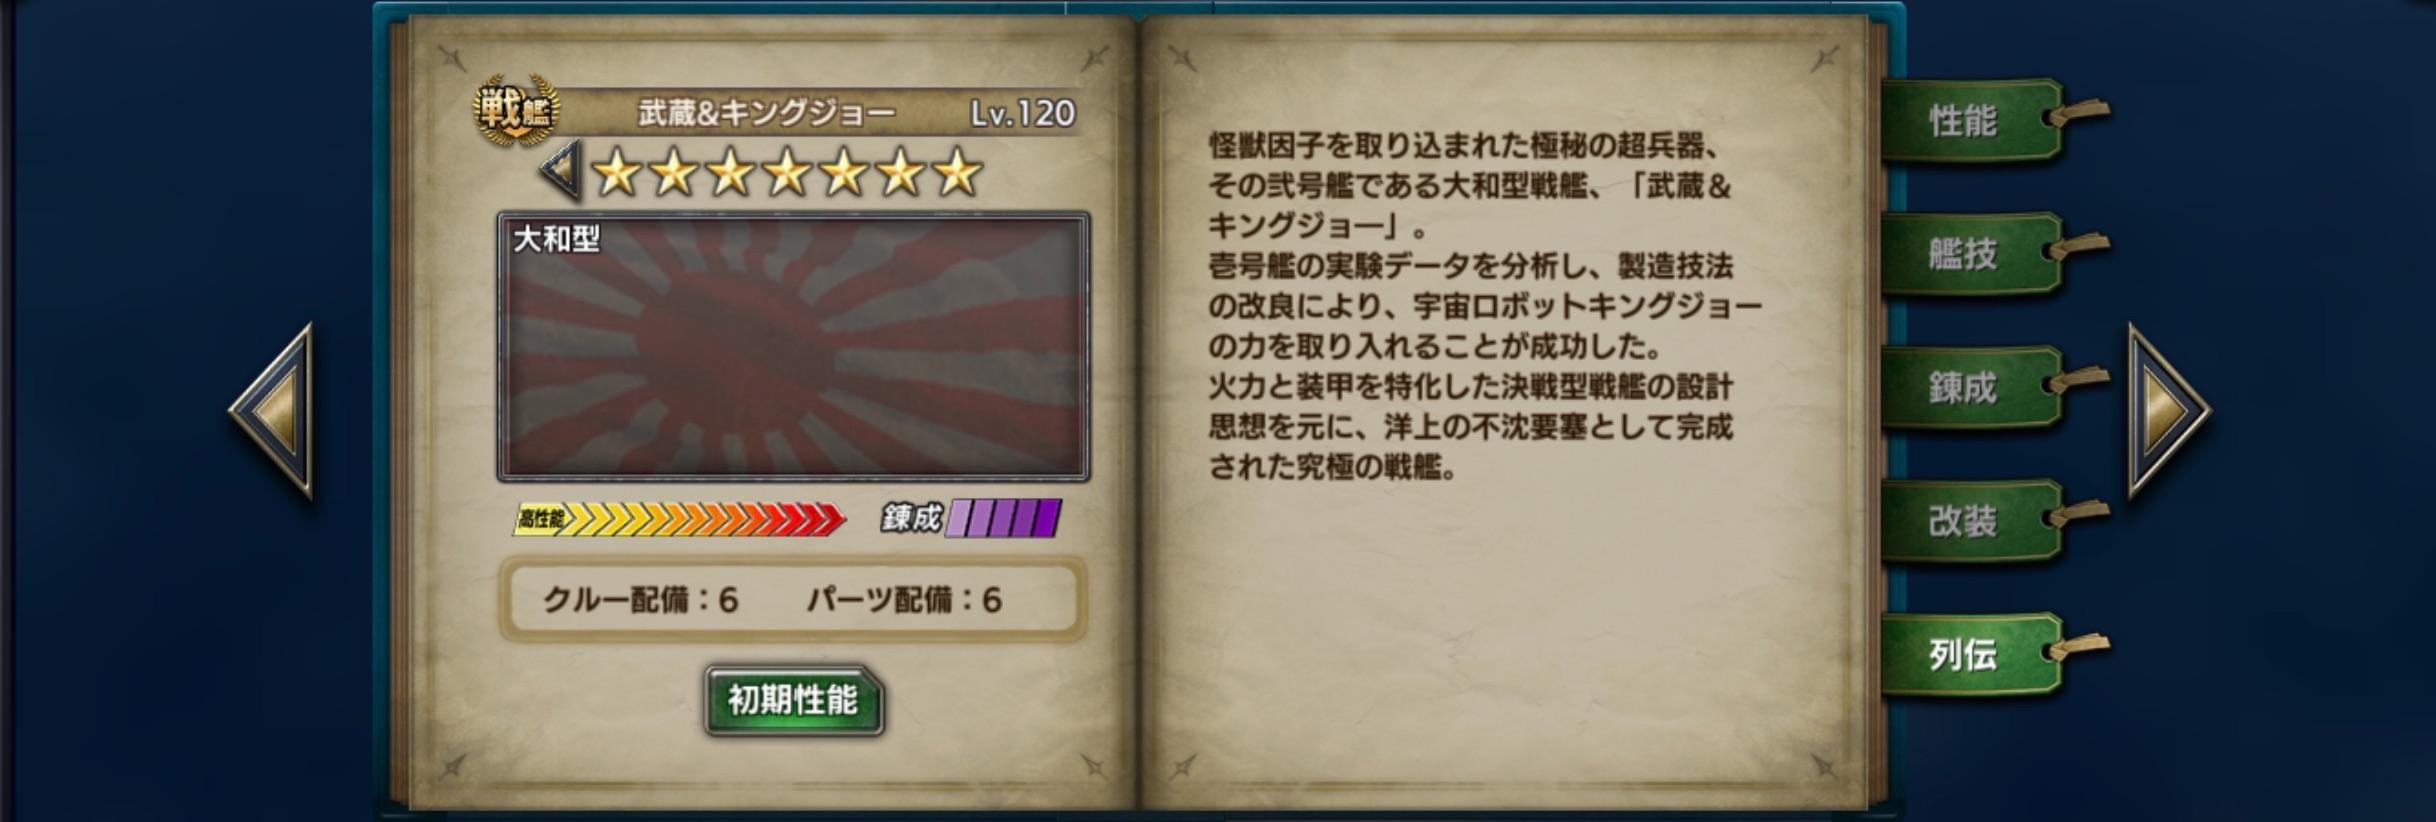 MusashiK-history